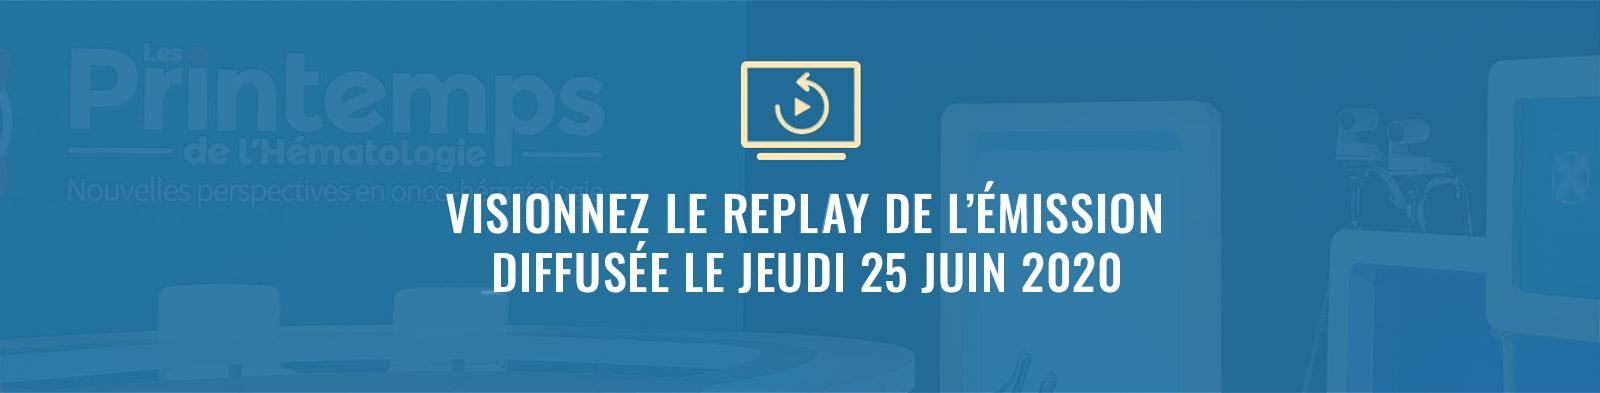 voir_le_replay